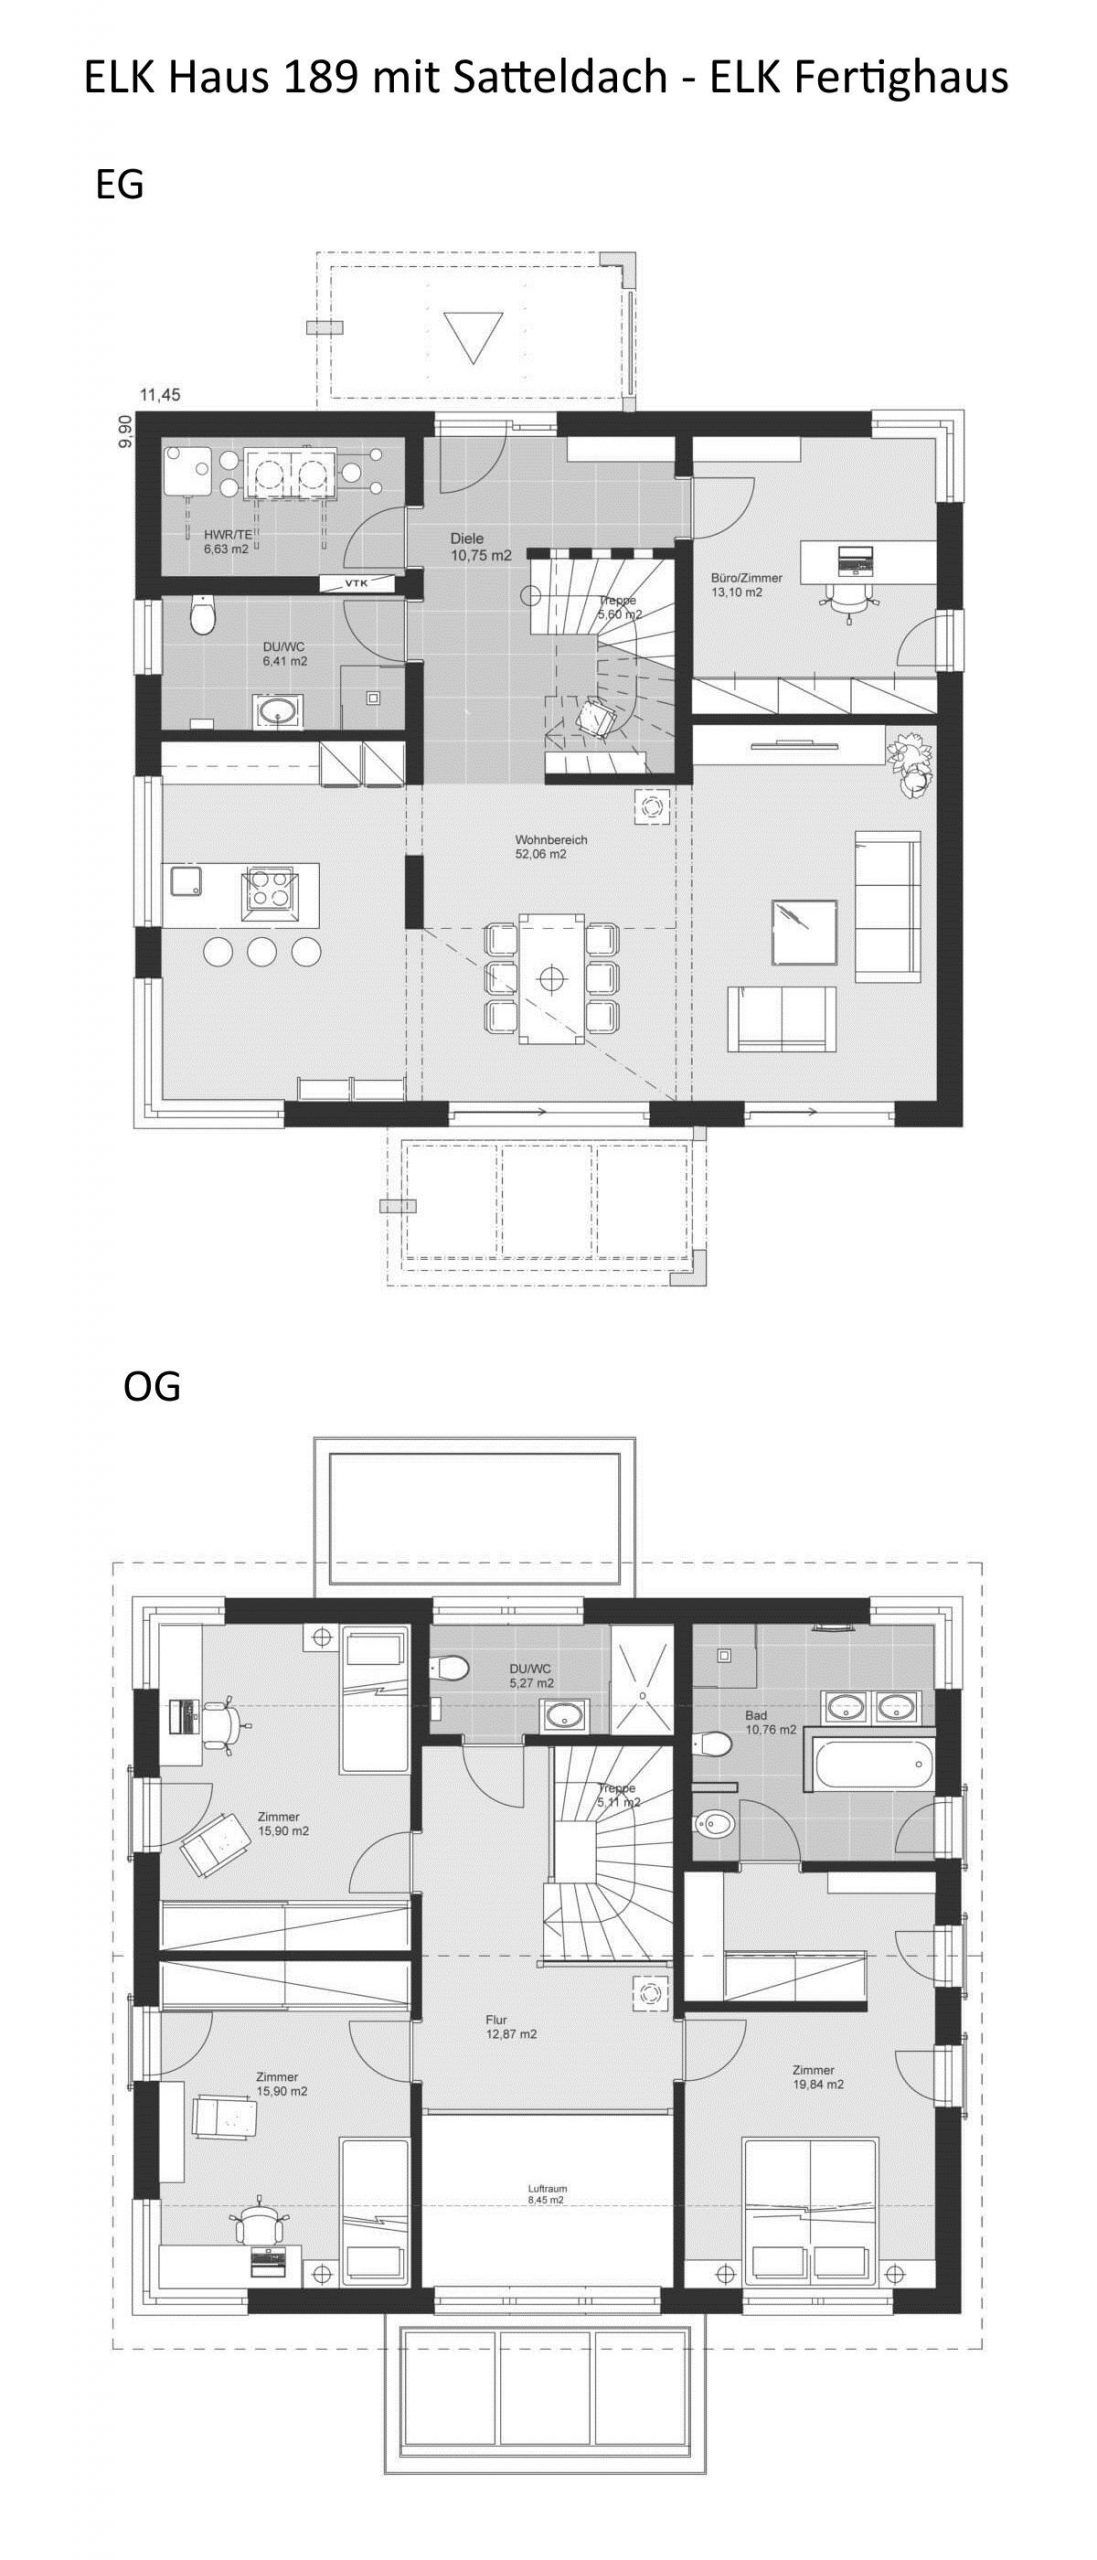 Einfamilienhaus Elk Haus 189 Mit Galerie Elk Fertighaus Hausbaudirekt Einfamilienhaus Elk Fertighaus Galerie In 2020 Roof Architecture Floor Plans Prefab Homes